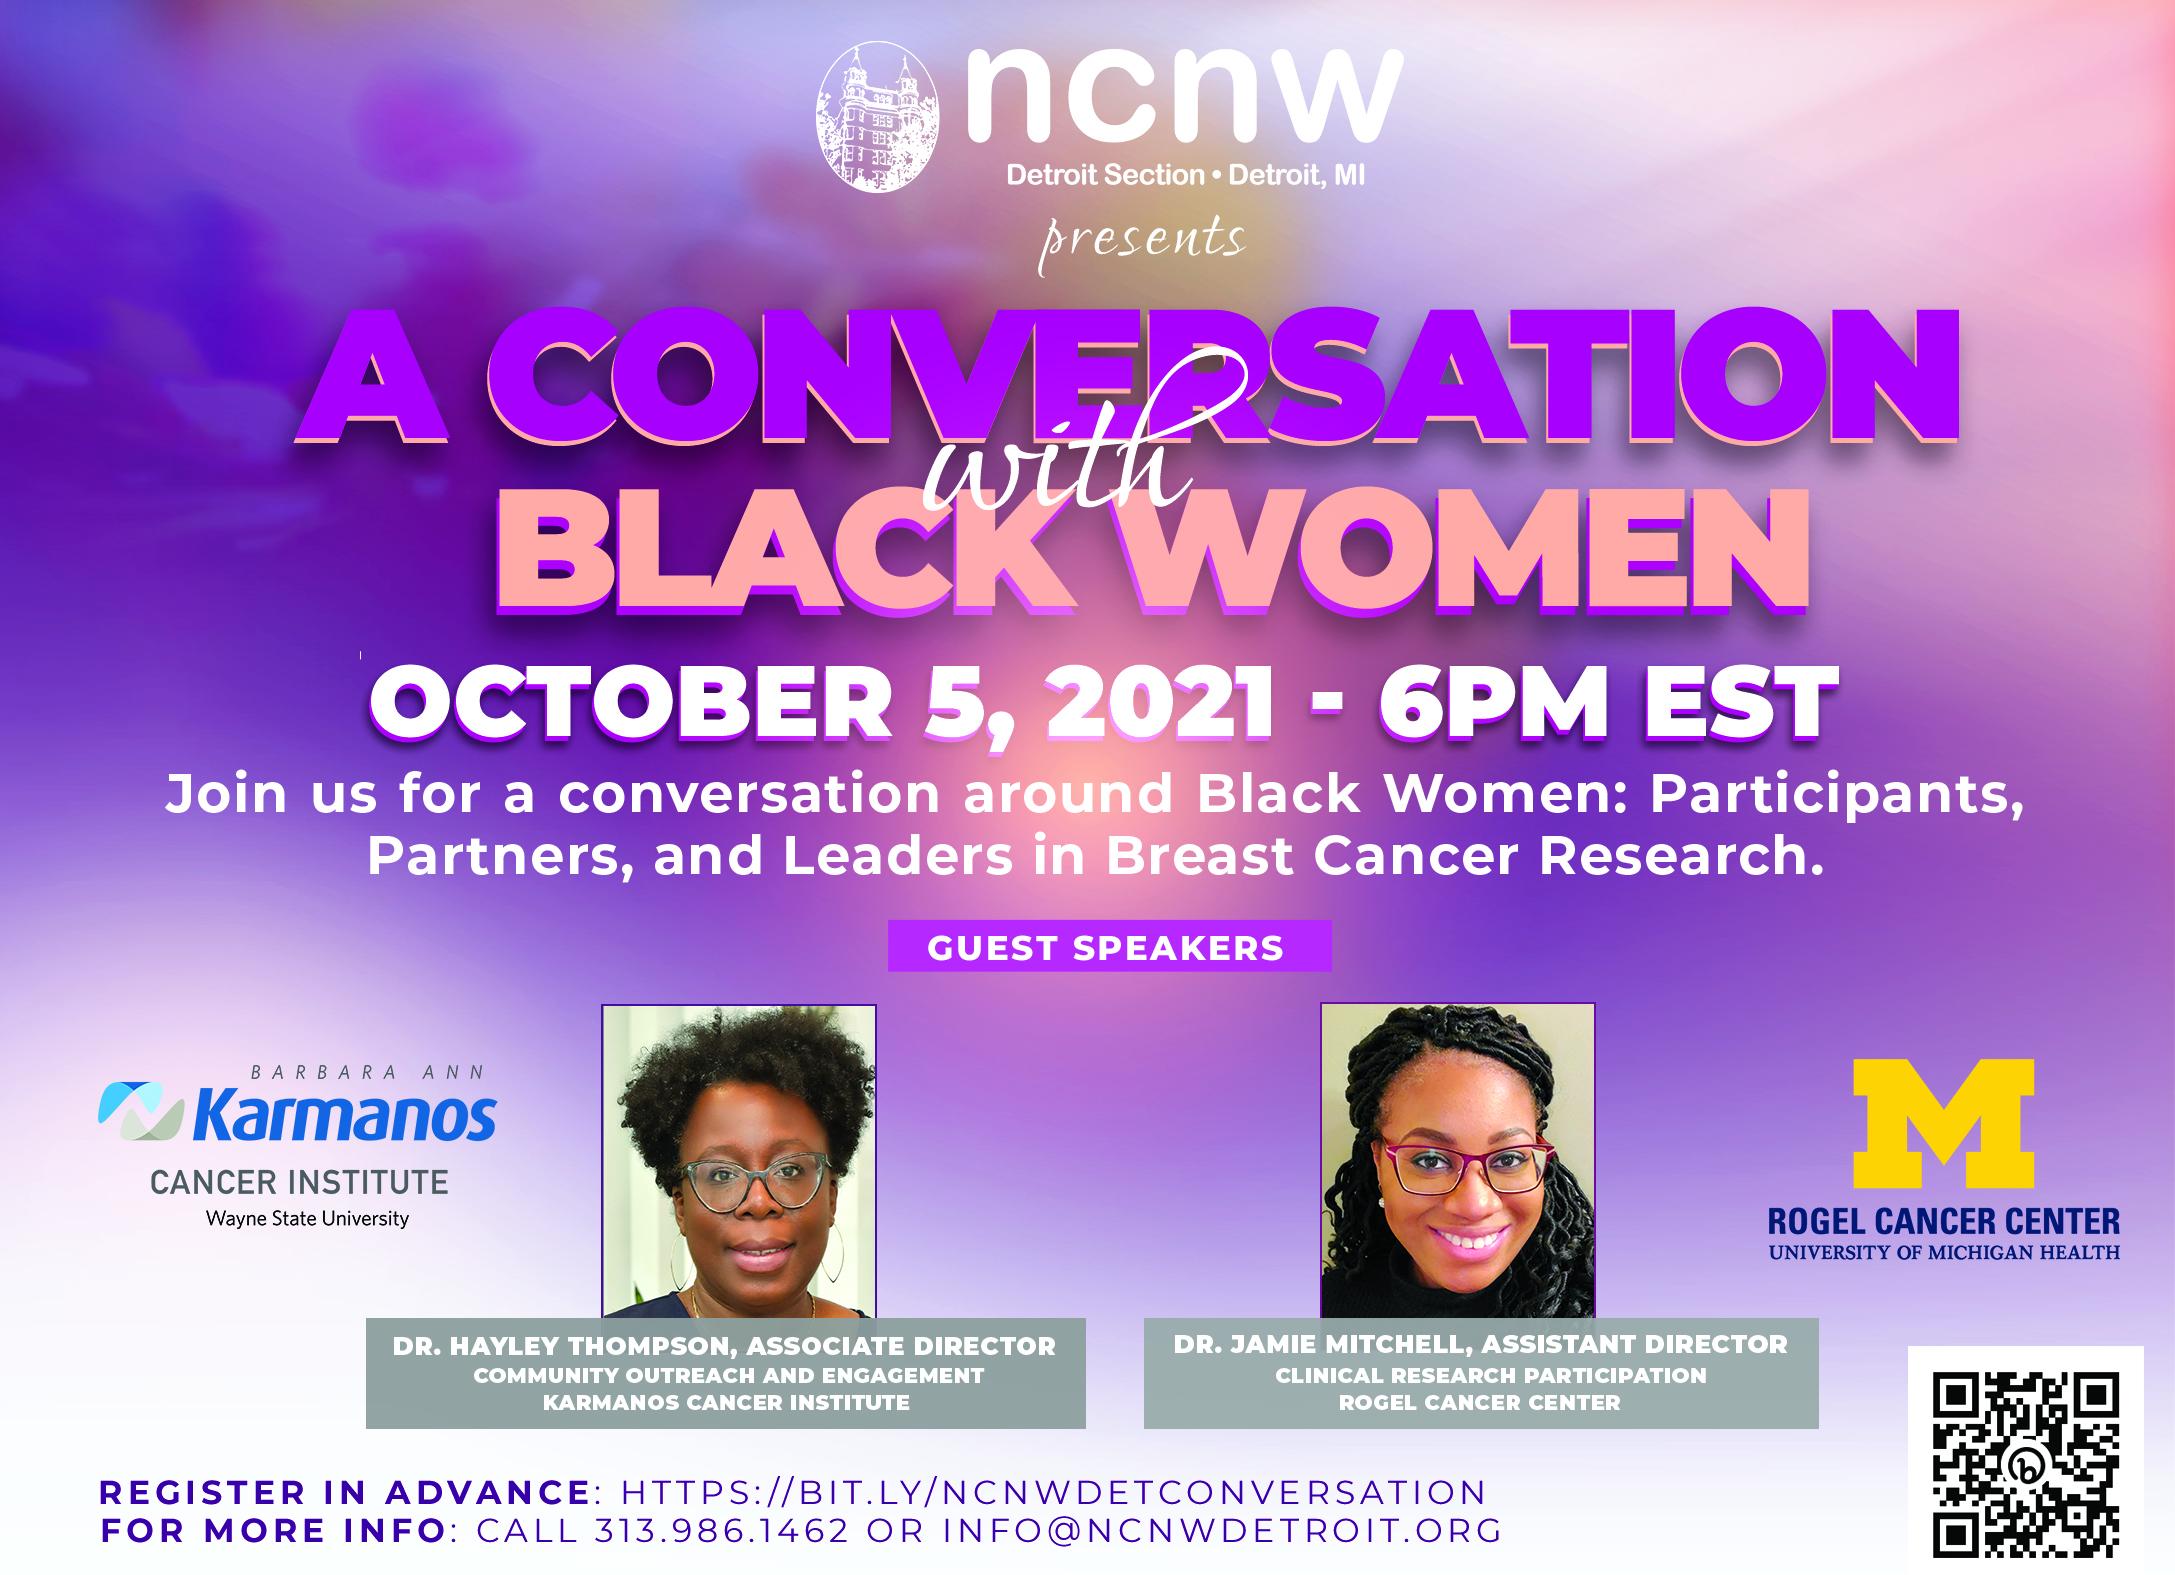 2021 DET NCNW Breast Cancer Awarness - A Conversation 2